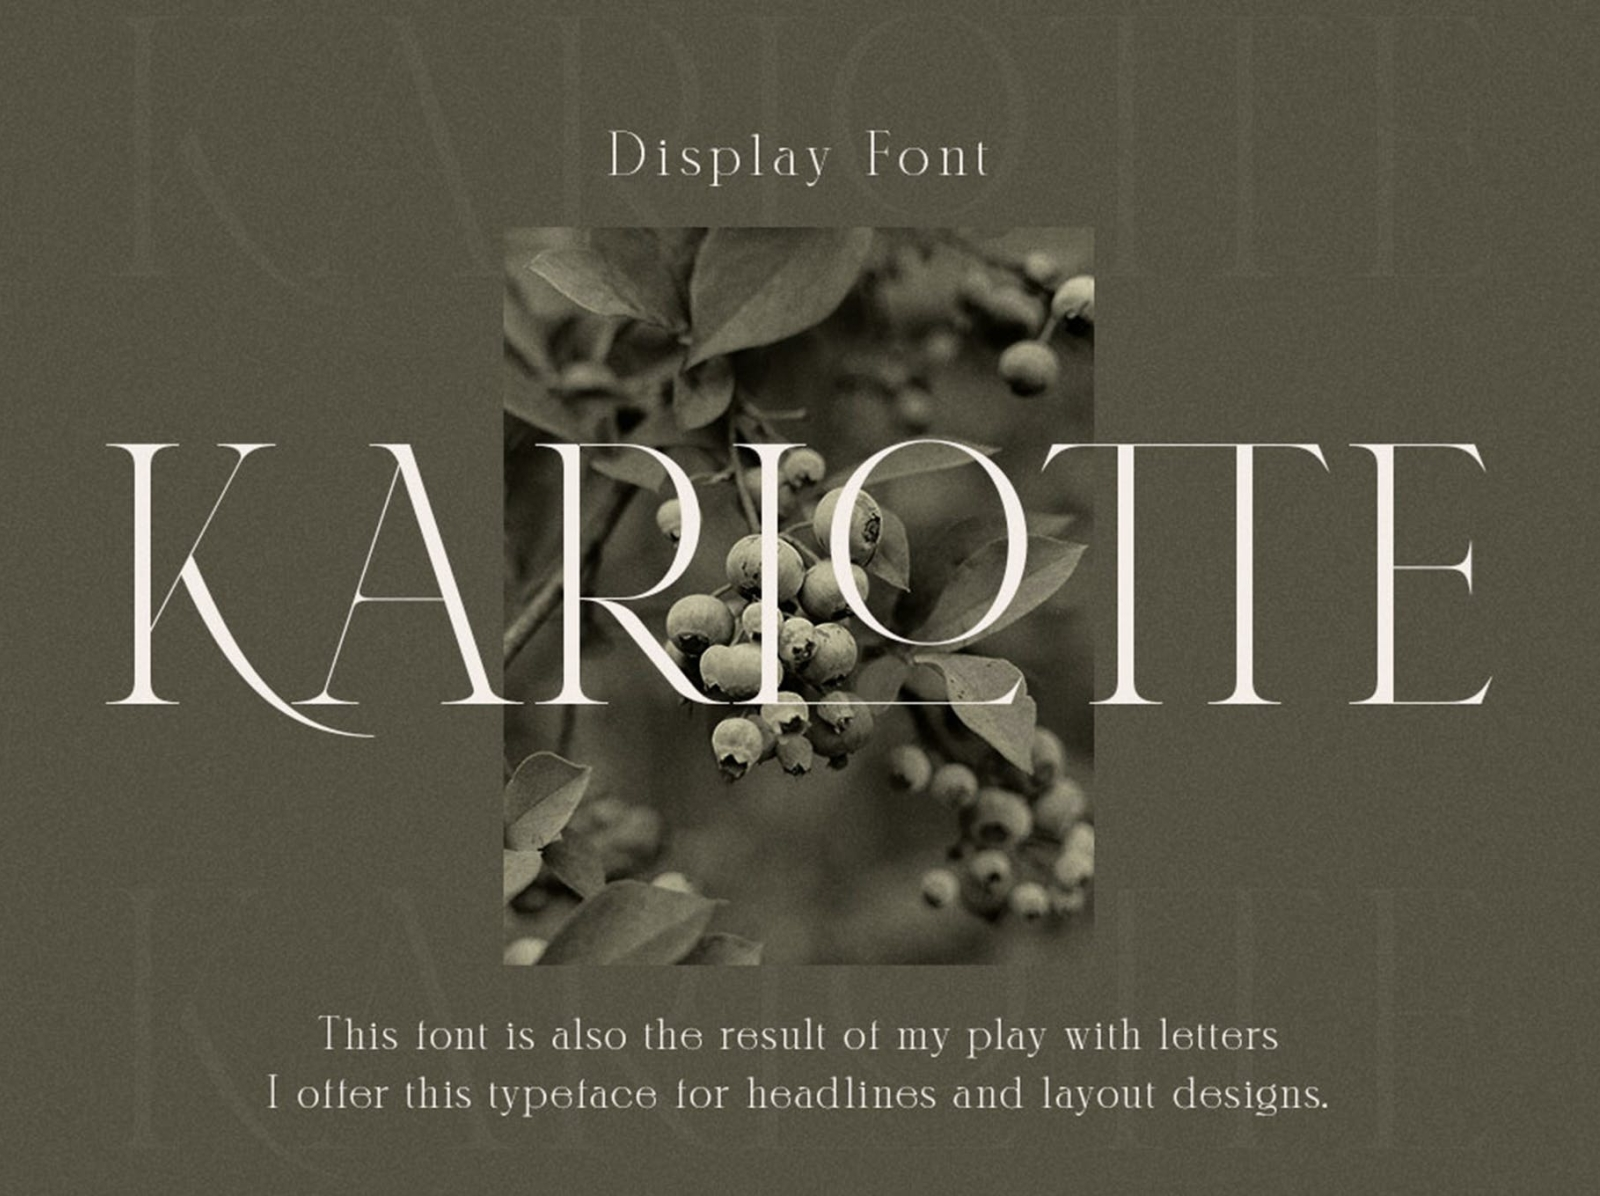 Karlotte - Elegant Serif Font serif font serif elegant typeface font display ux vector ui logo app typography illustration graphic design design branding